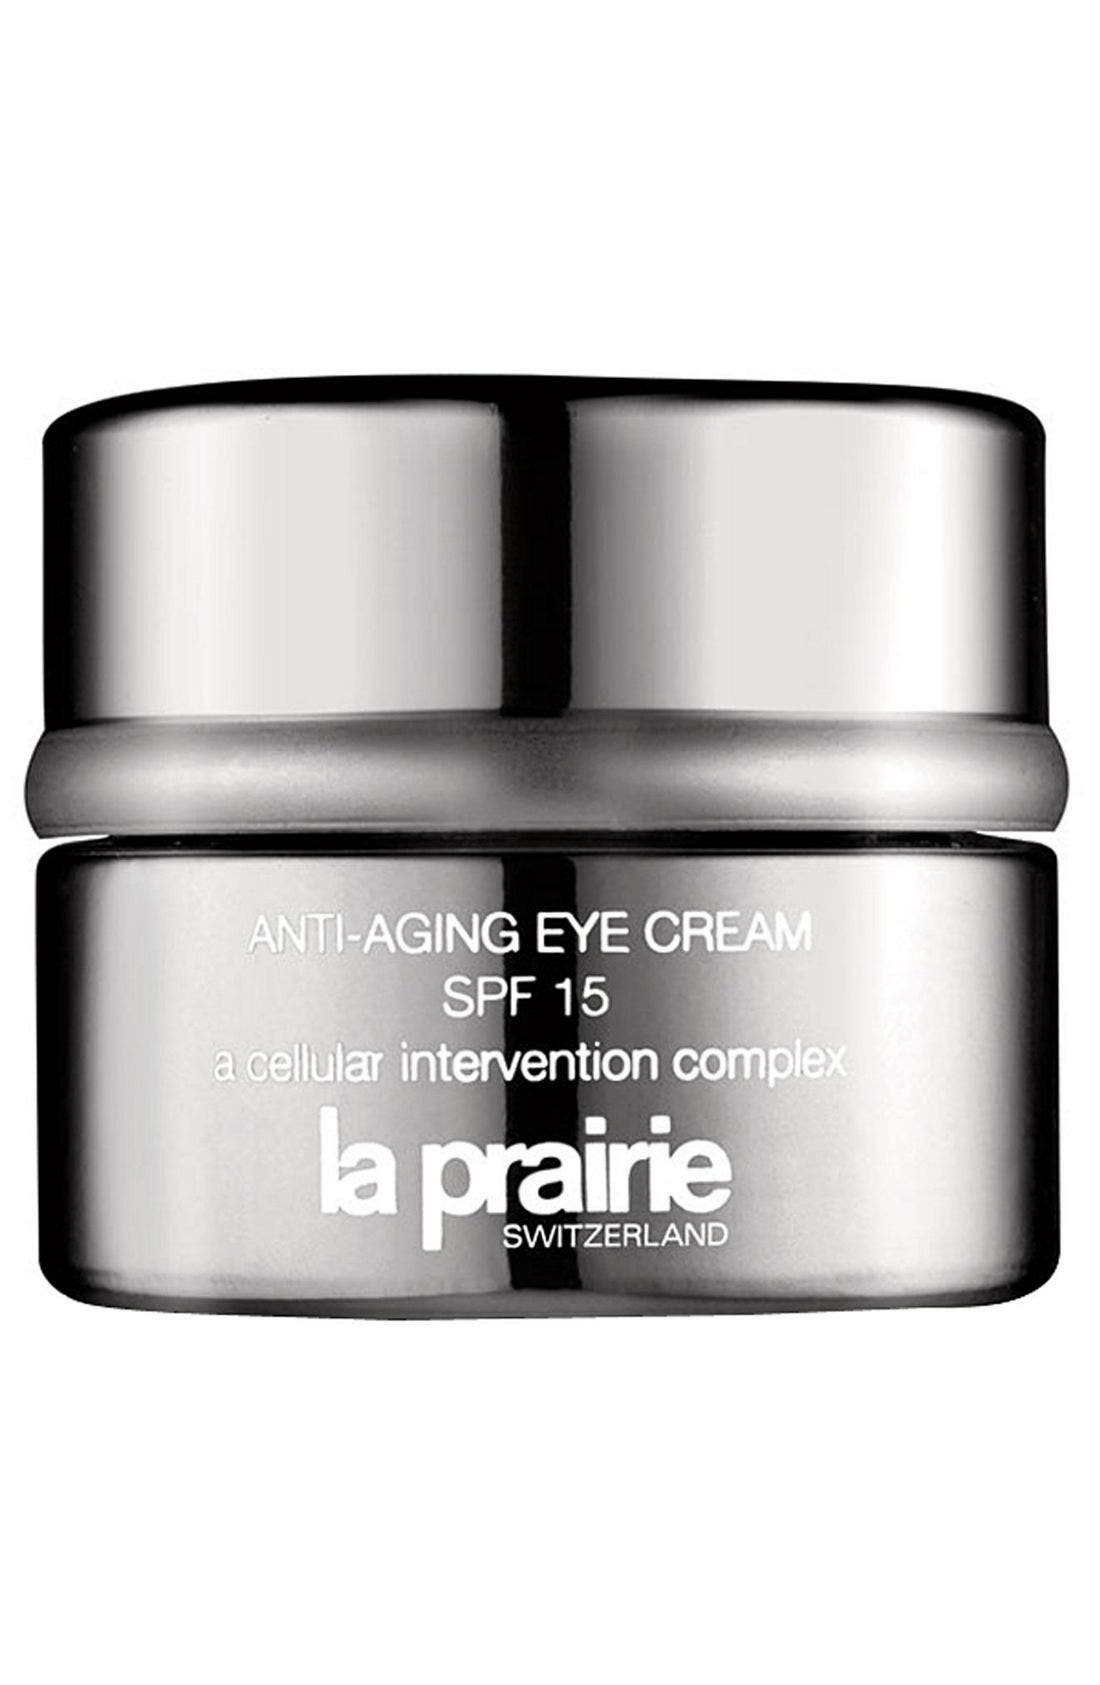 La Prairie Anti-Aging Eye Cream Sunscreen Broad Spectrum SPF 15